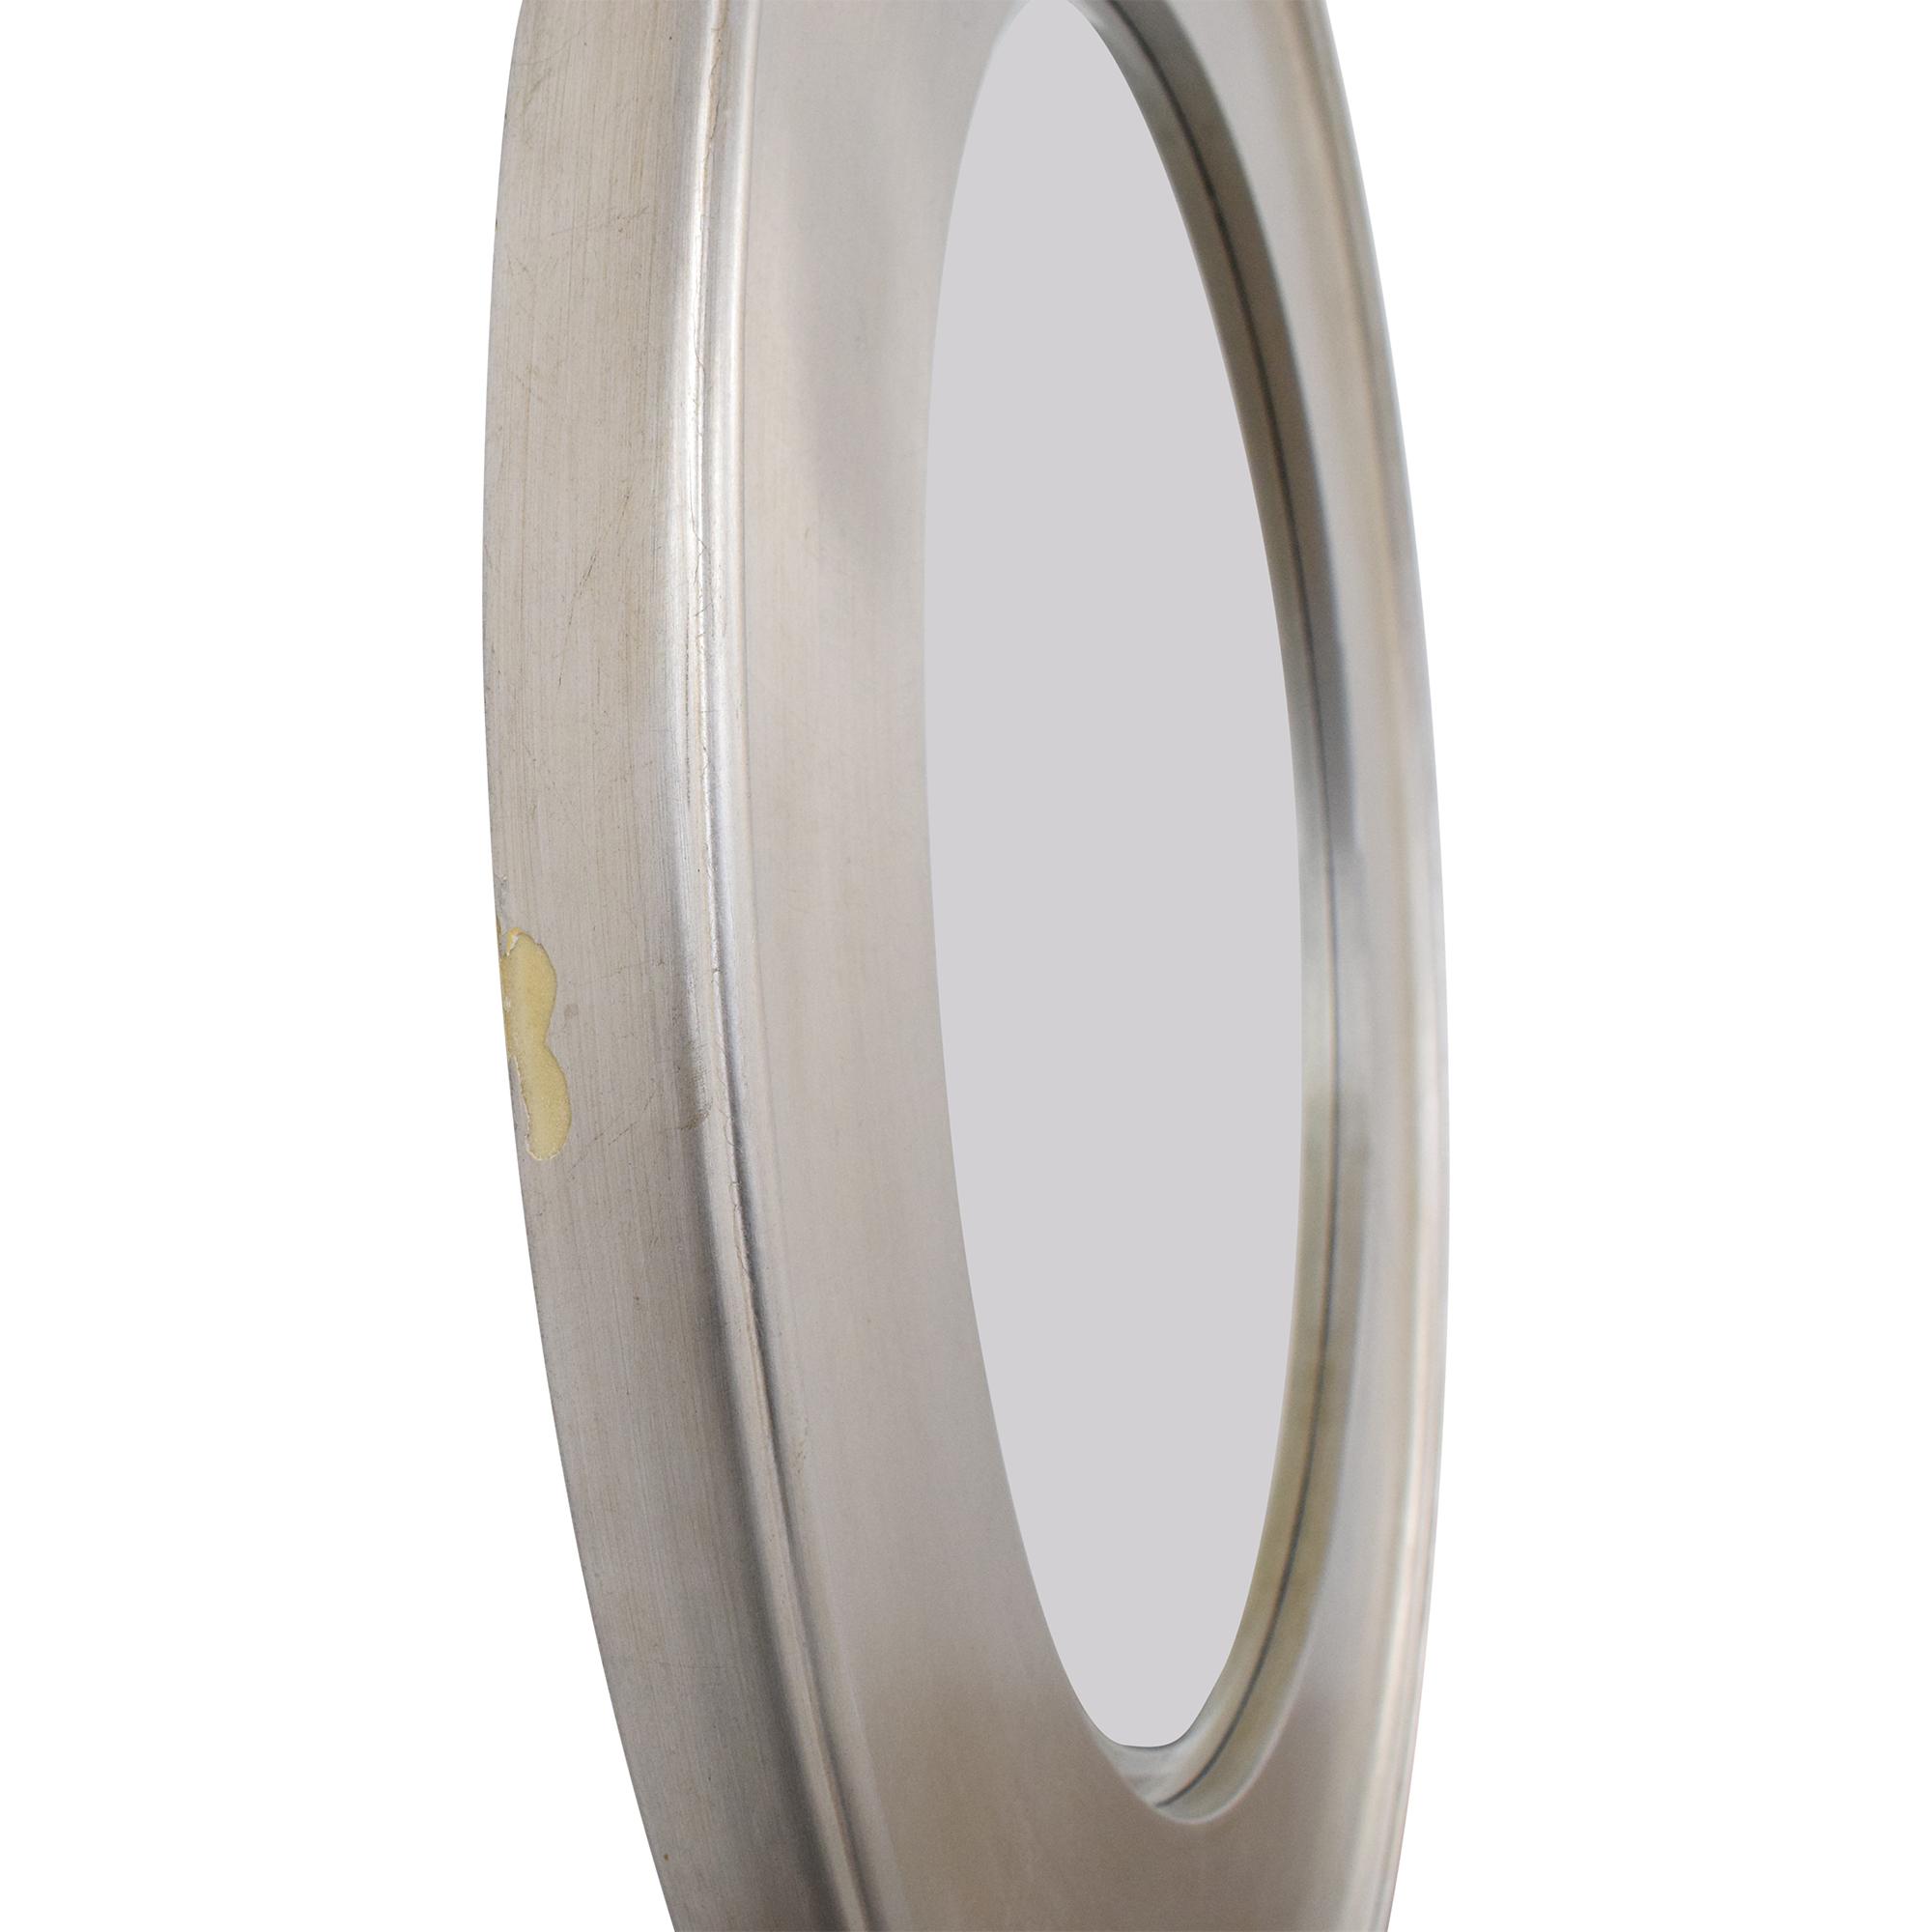 buy Basset Mirror Company Ursula Mirror Bassett Mirror Company Decor